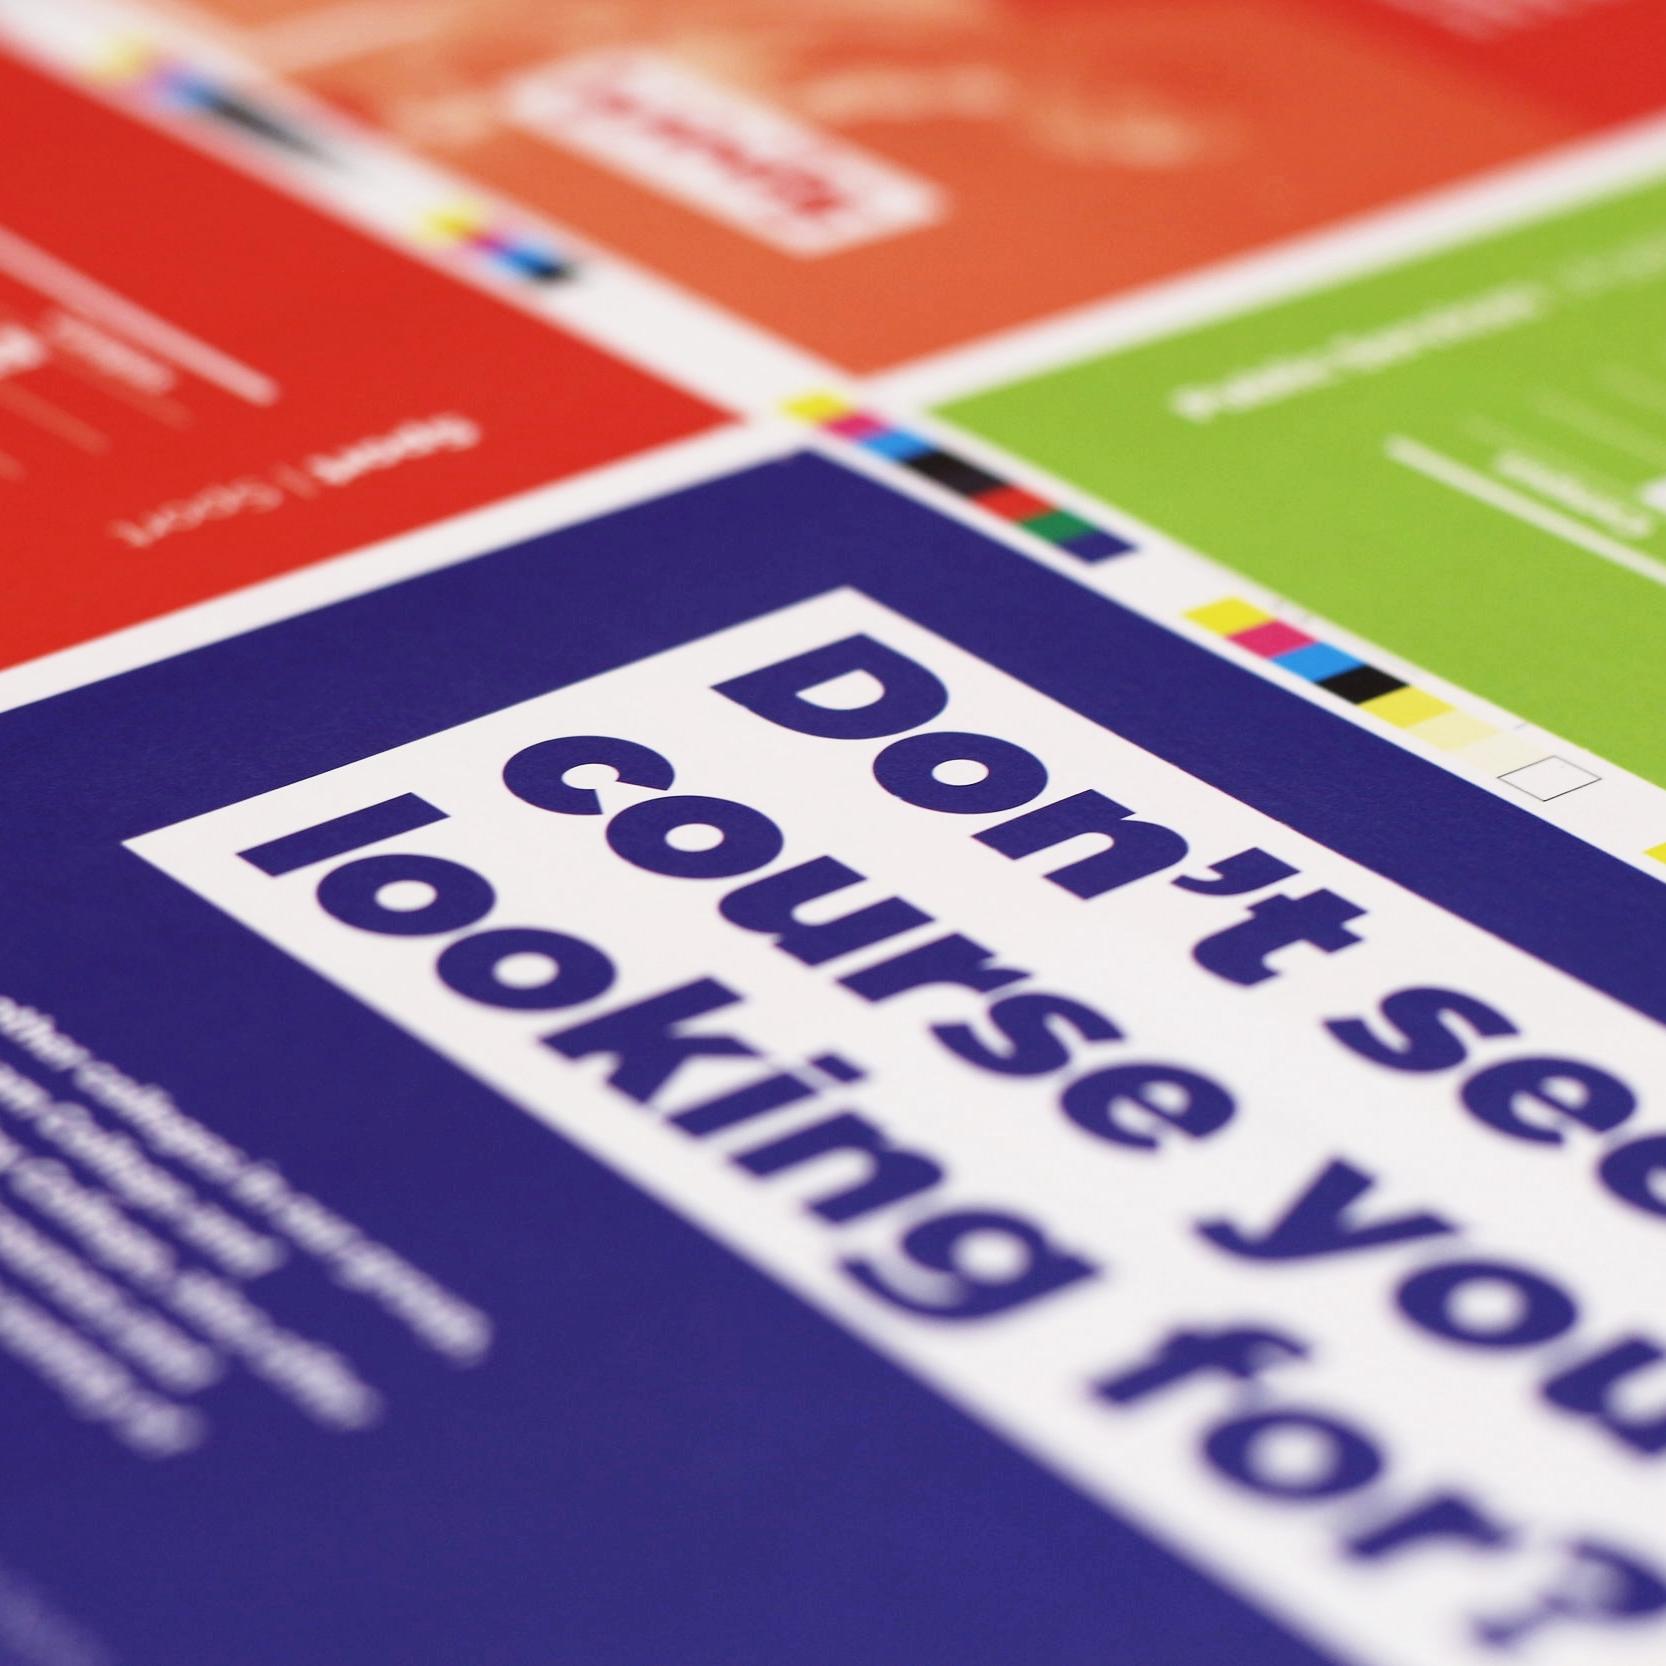 Course Guide Print